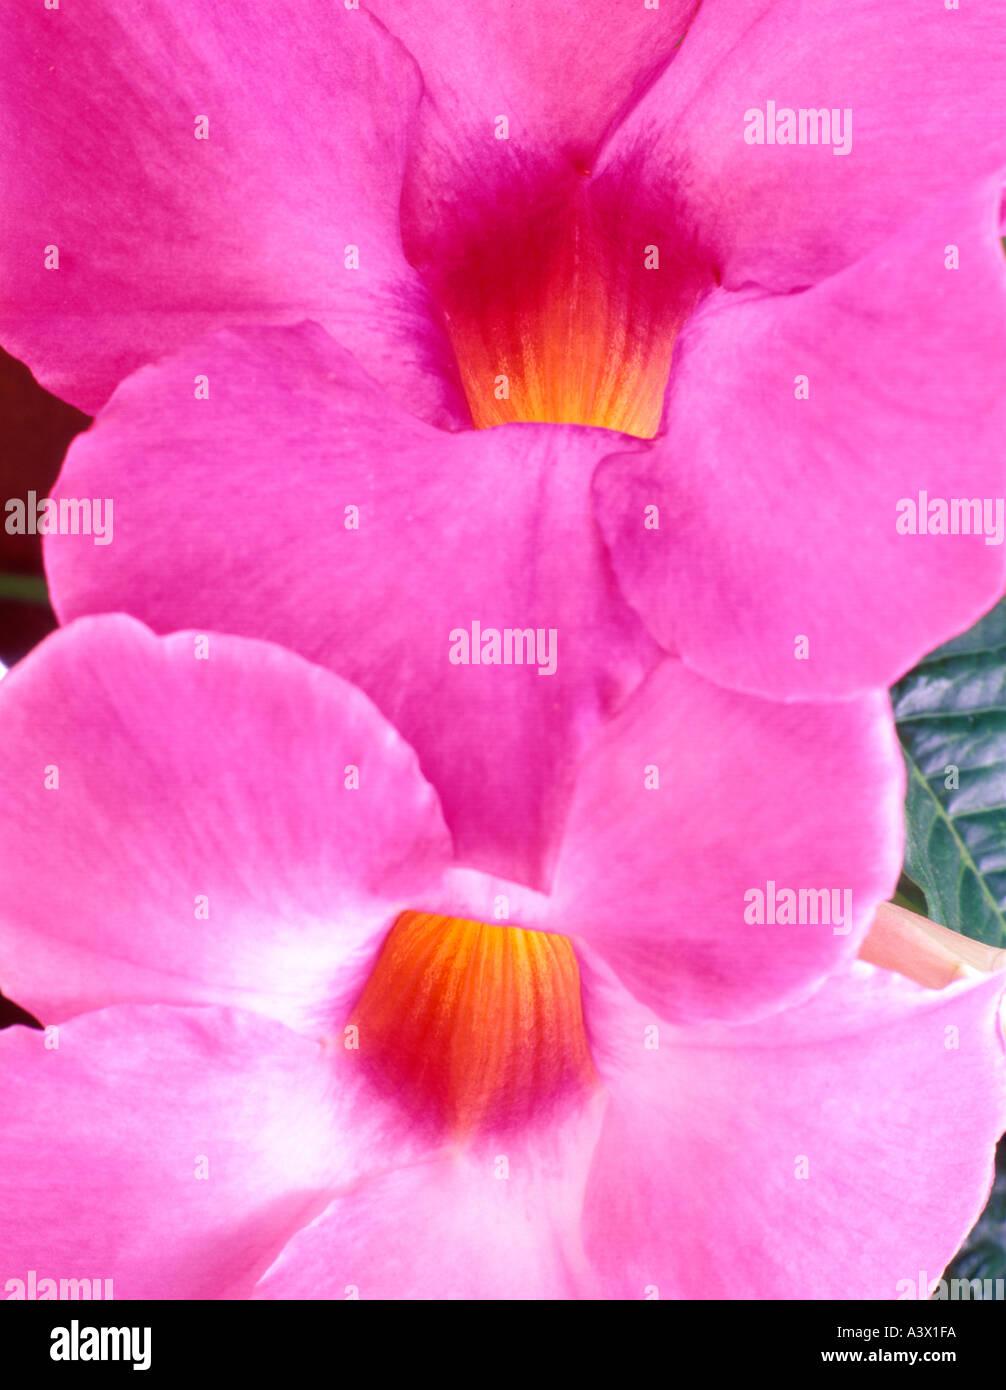 V00161M Tiff Mandevilla Alice Dupont Blumen Kristall Gärten Victoria British Columbia Kanada Stockbild